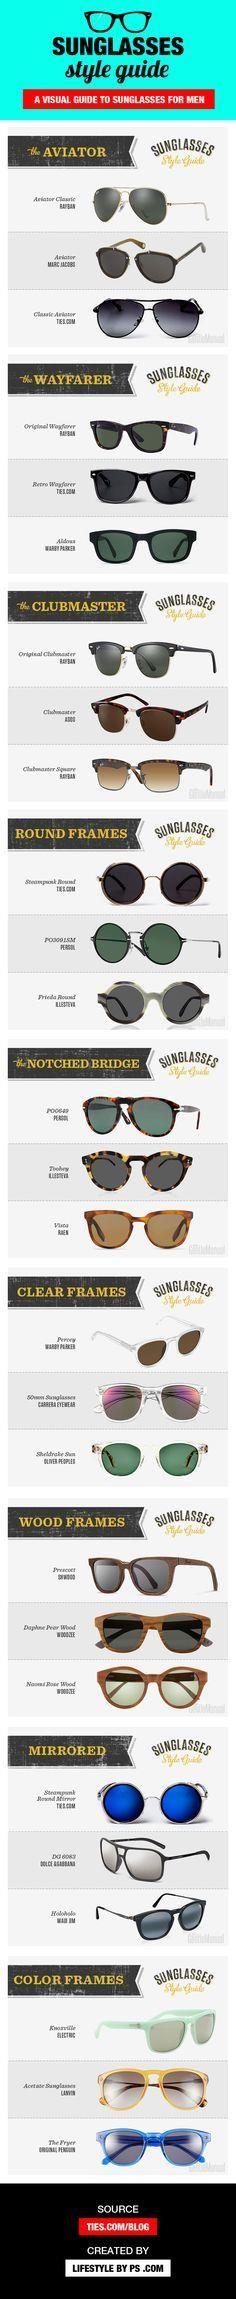 2015 Ray ban sunglas    2015 Ray ban sunglasses for men and women,best stuff  #rayban   #ray_ban   #rayban_sunglasses  ray ban sunglasses,ray ban outlet$12.99